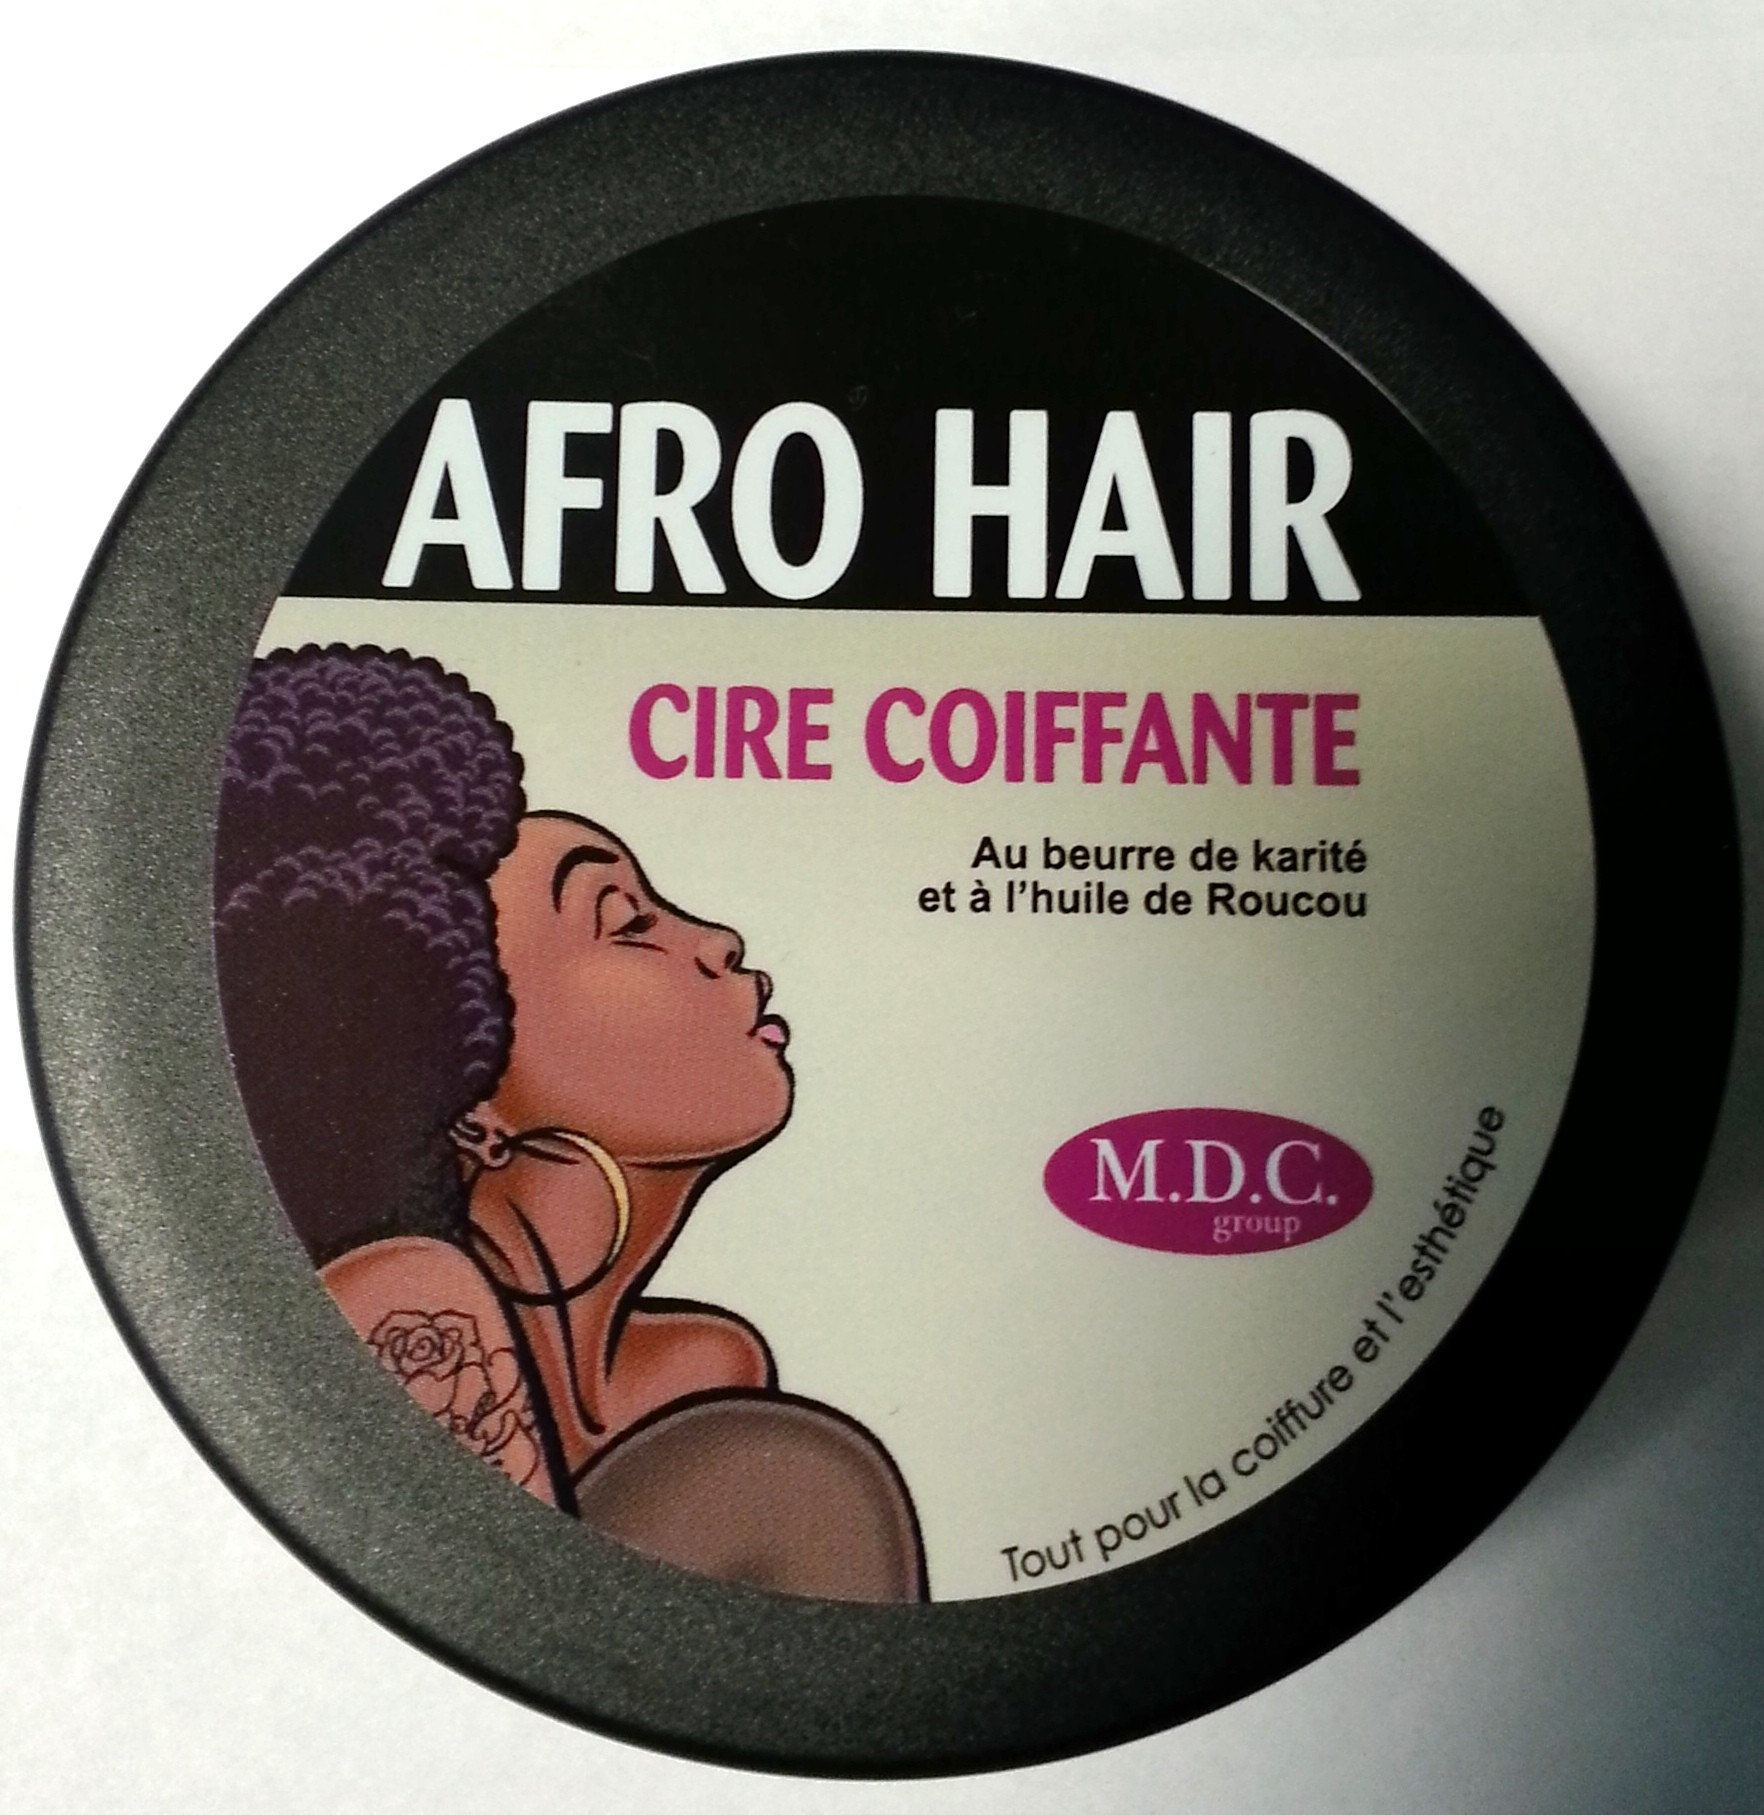 Populaire Cire coiffante Afro hair 100ml NE26